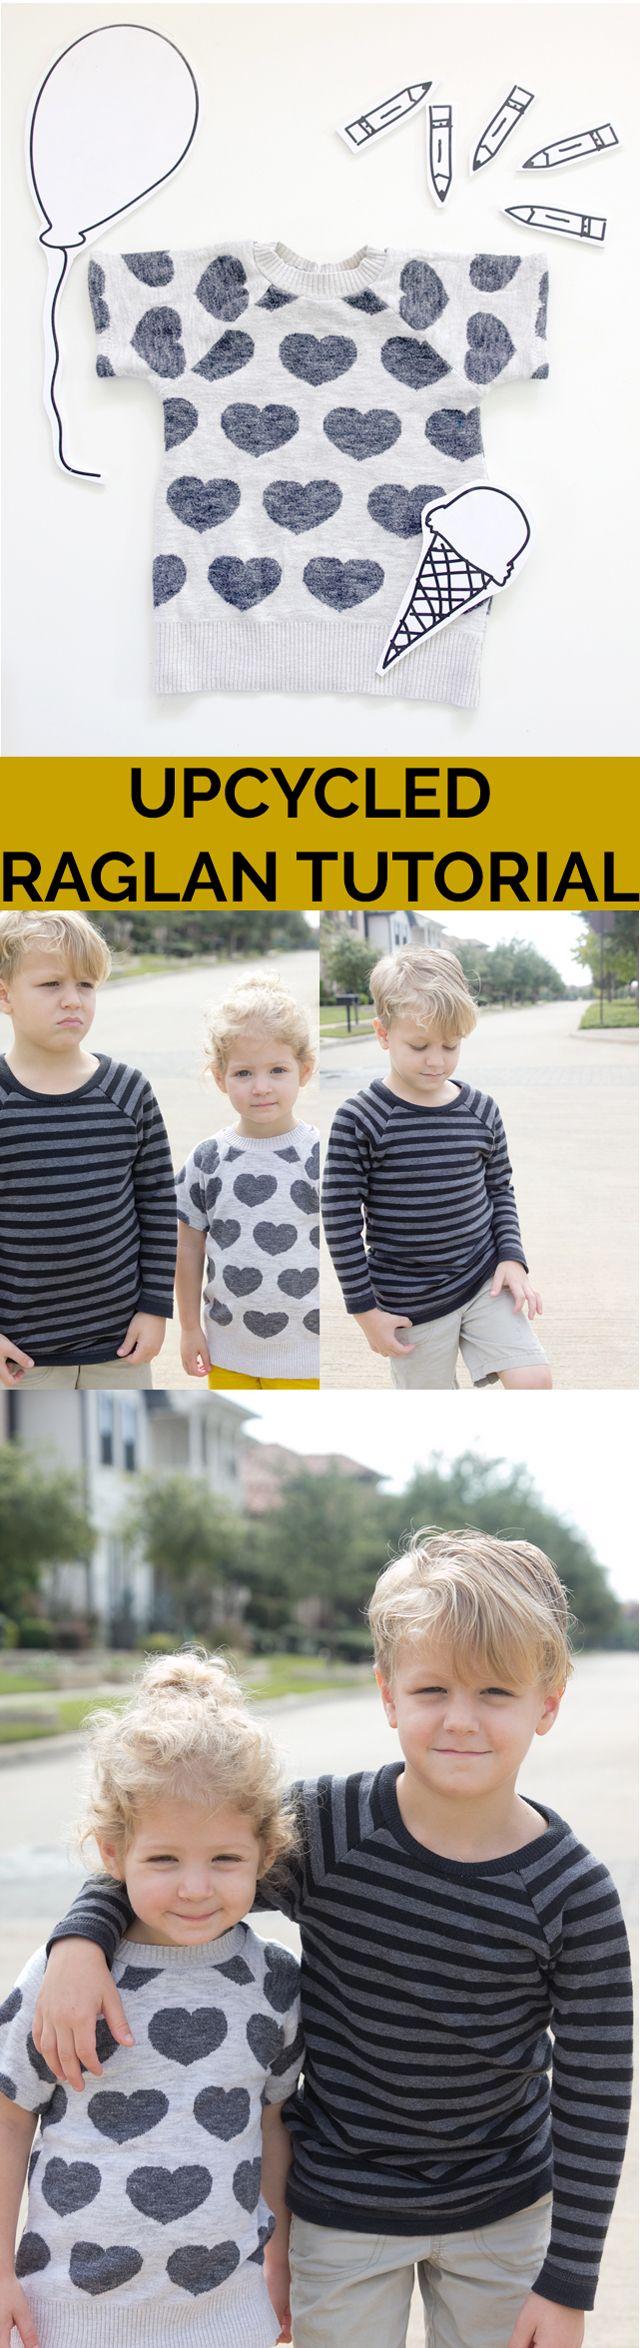 Upcycled Recess Raglan Tutorial